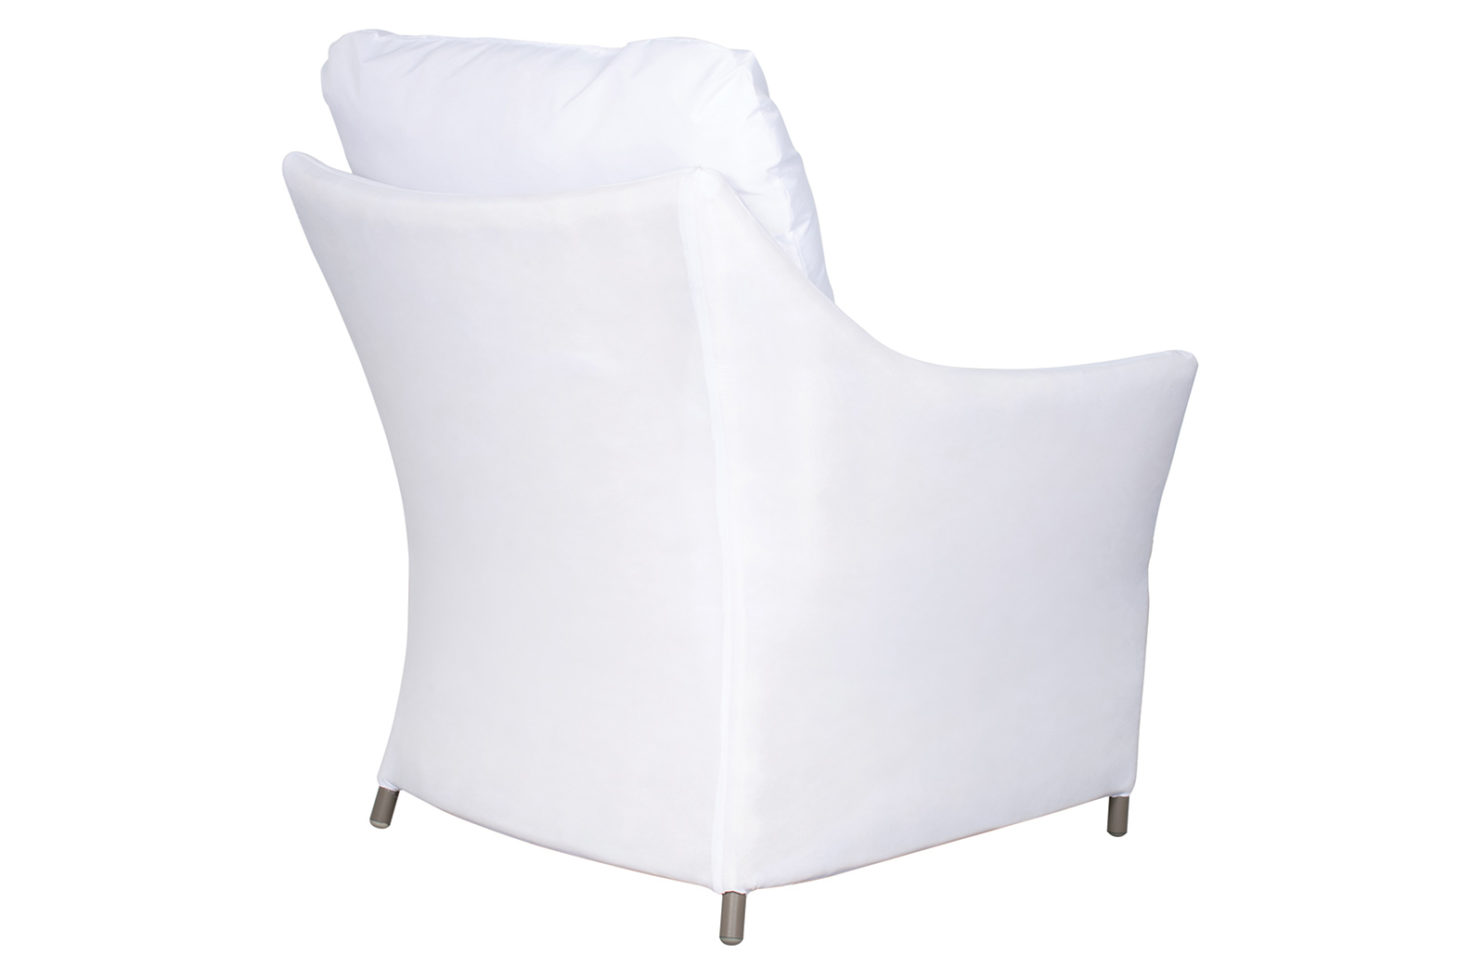 capri lounge frame 620FT091P2 1 3Q back